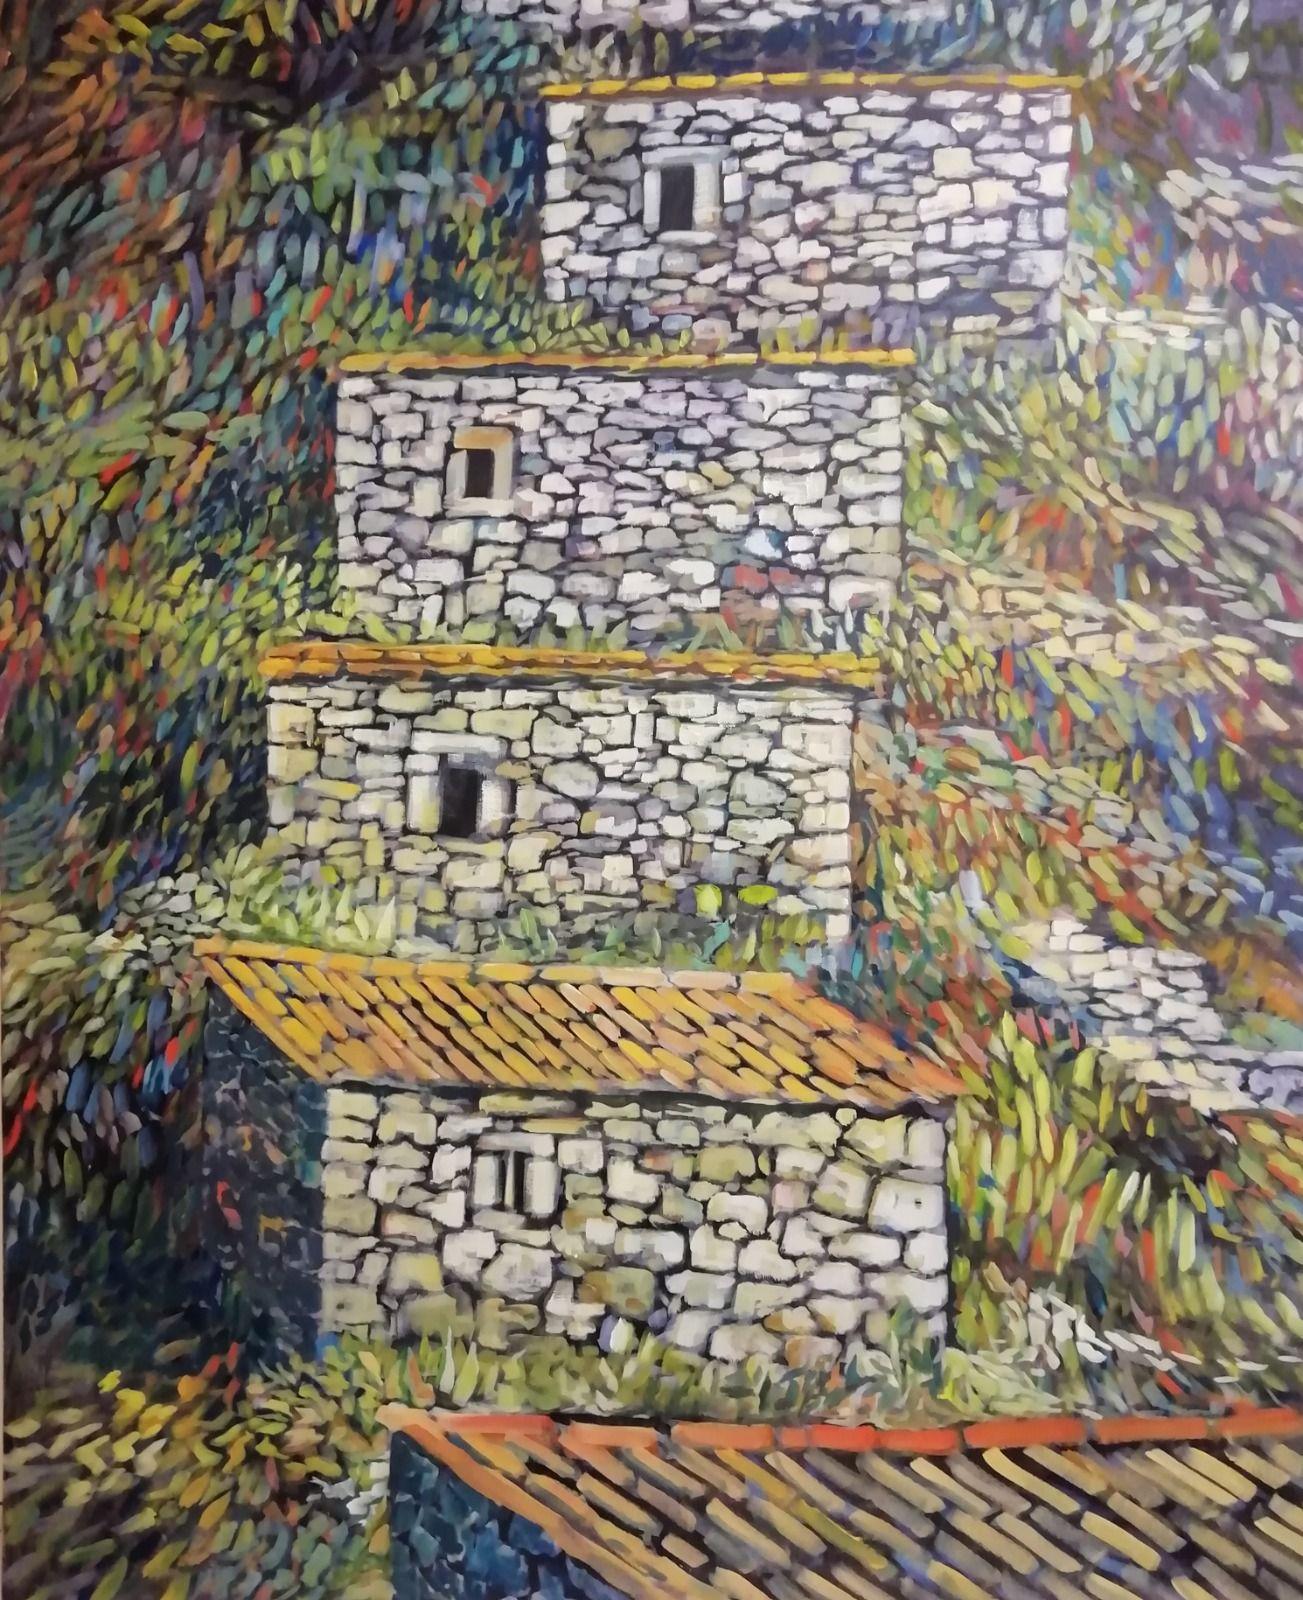 Obra de Daniel Amanfredi, de Aranda del Duero